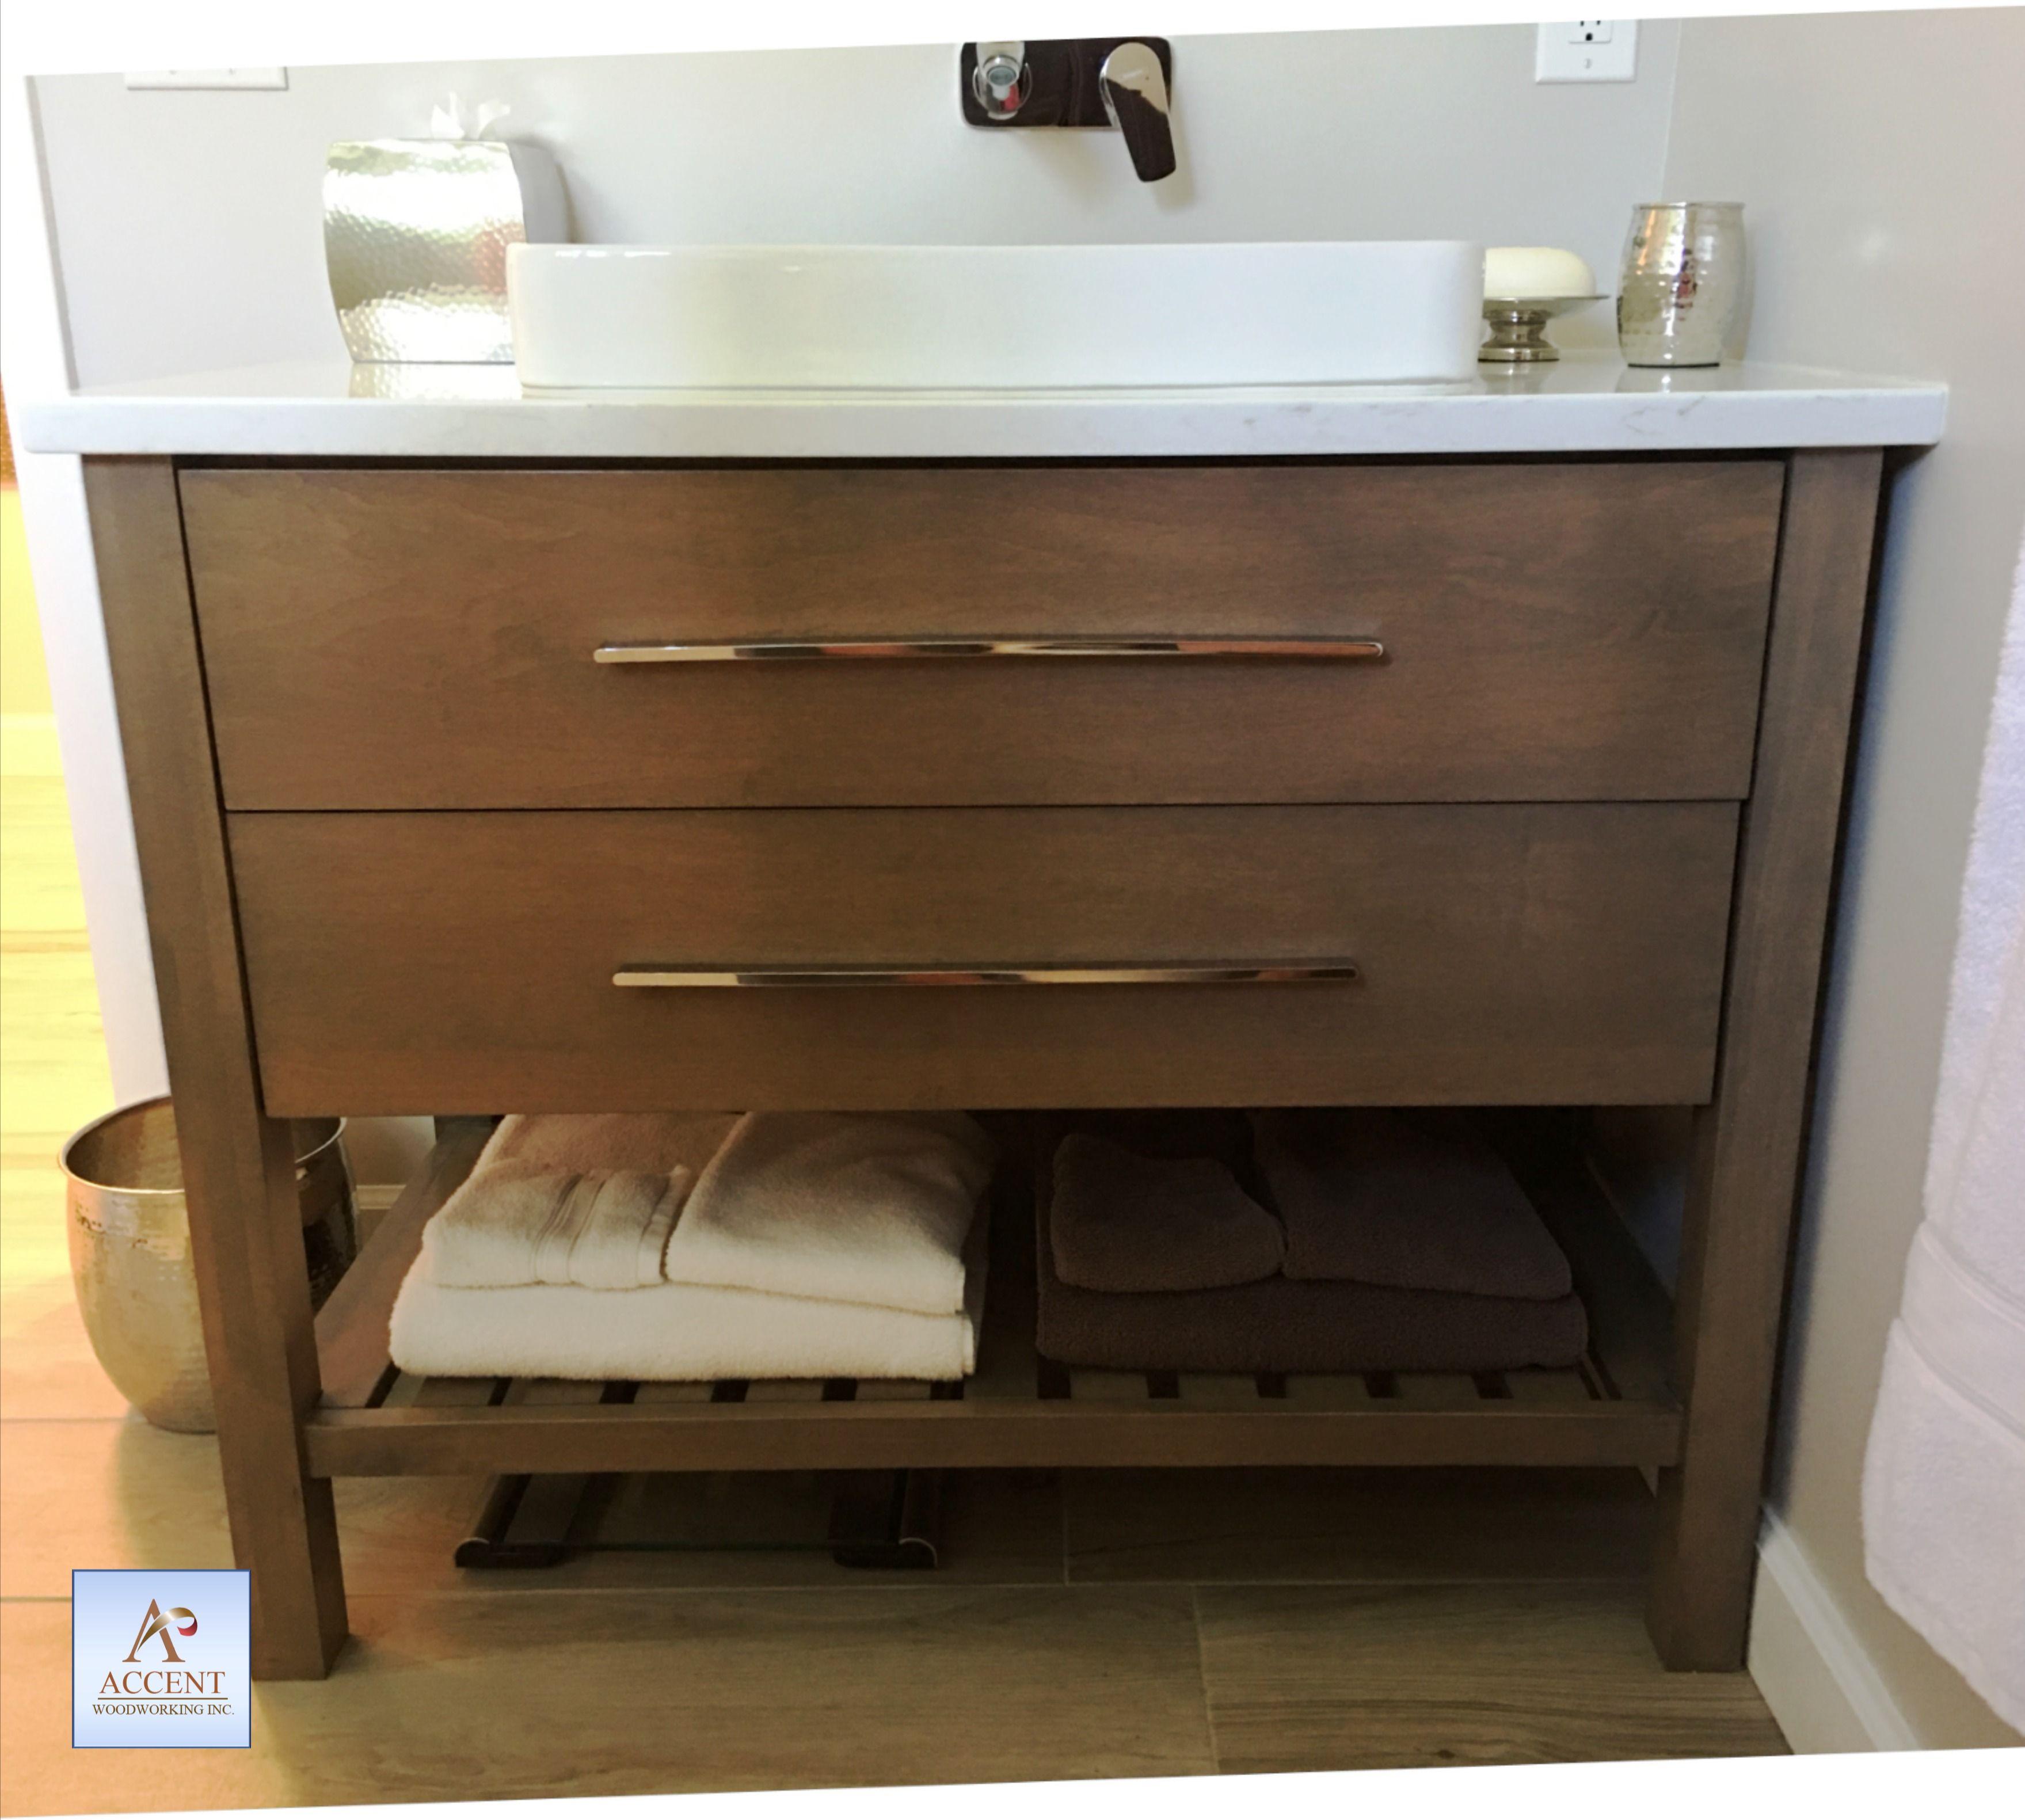 Custom Bath Vanity And Makeup Vanity Chest Custom Bathroom Vanity Bathroom Cabinetry Bathroom Vanity Cabinets [ 3162 x 3518 Pixel ]